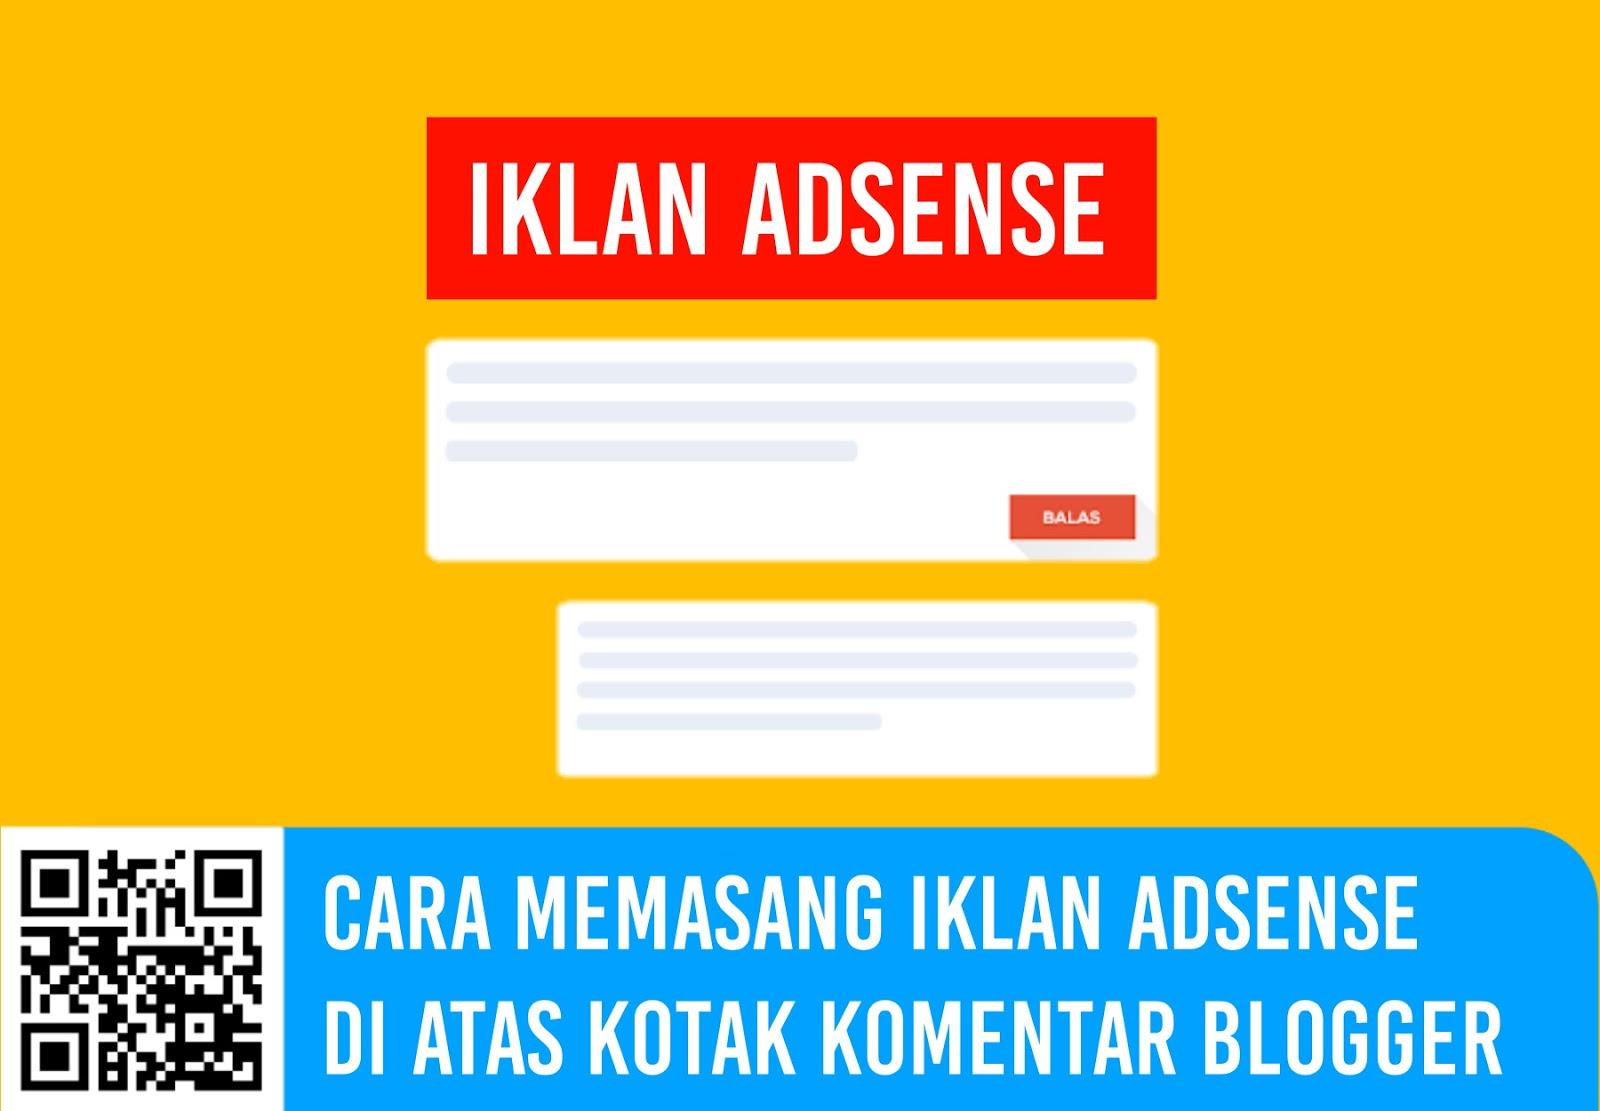 Cara Memasang Iklan Adsense di Atas Kotak Komentar Blogger